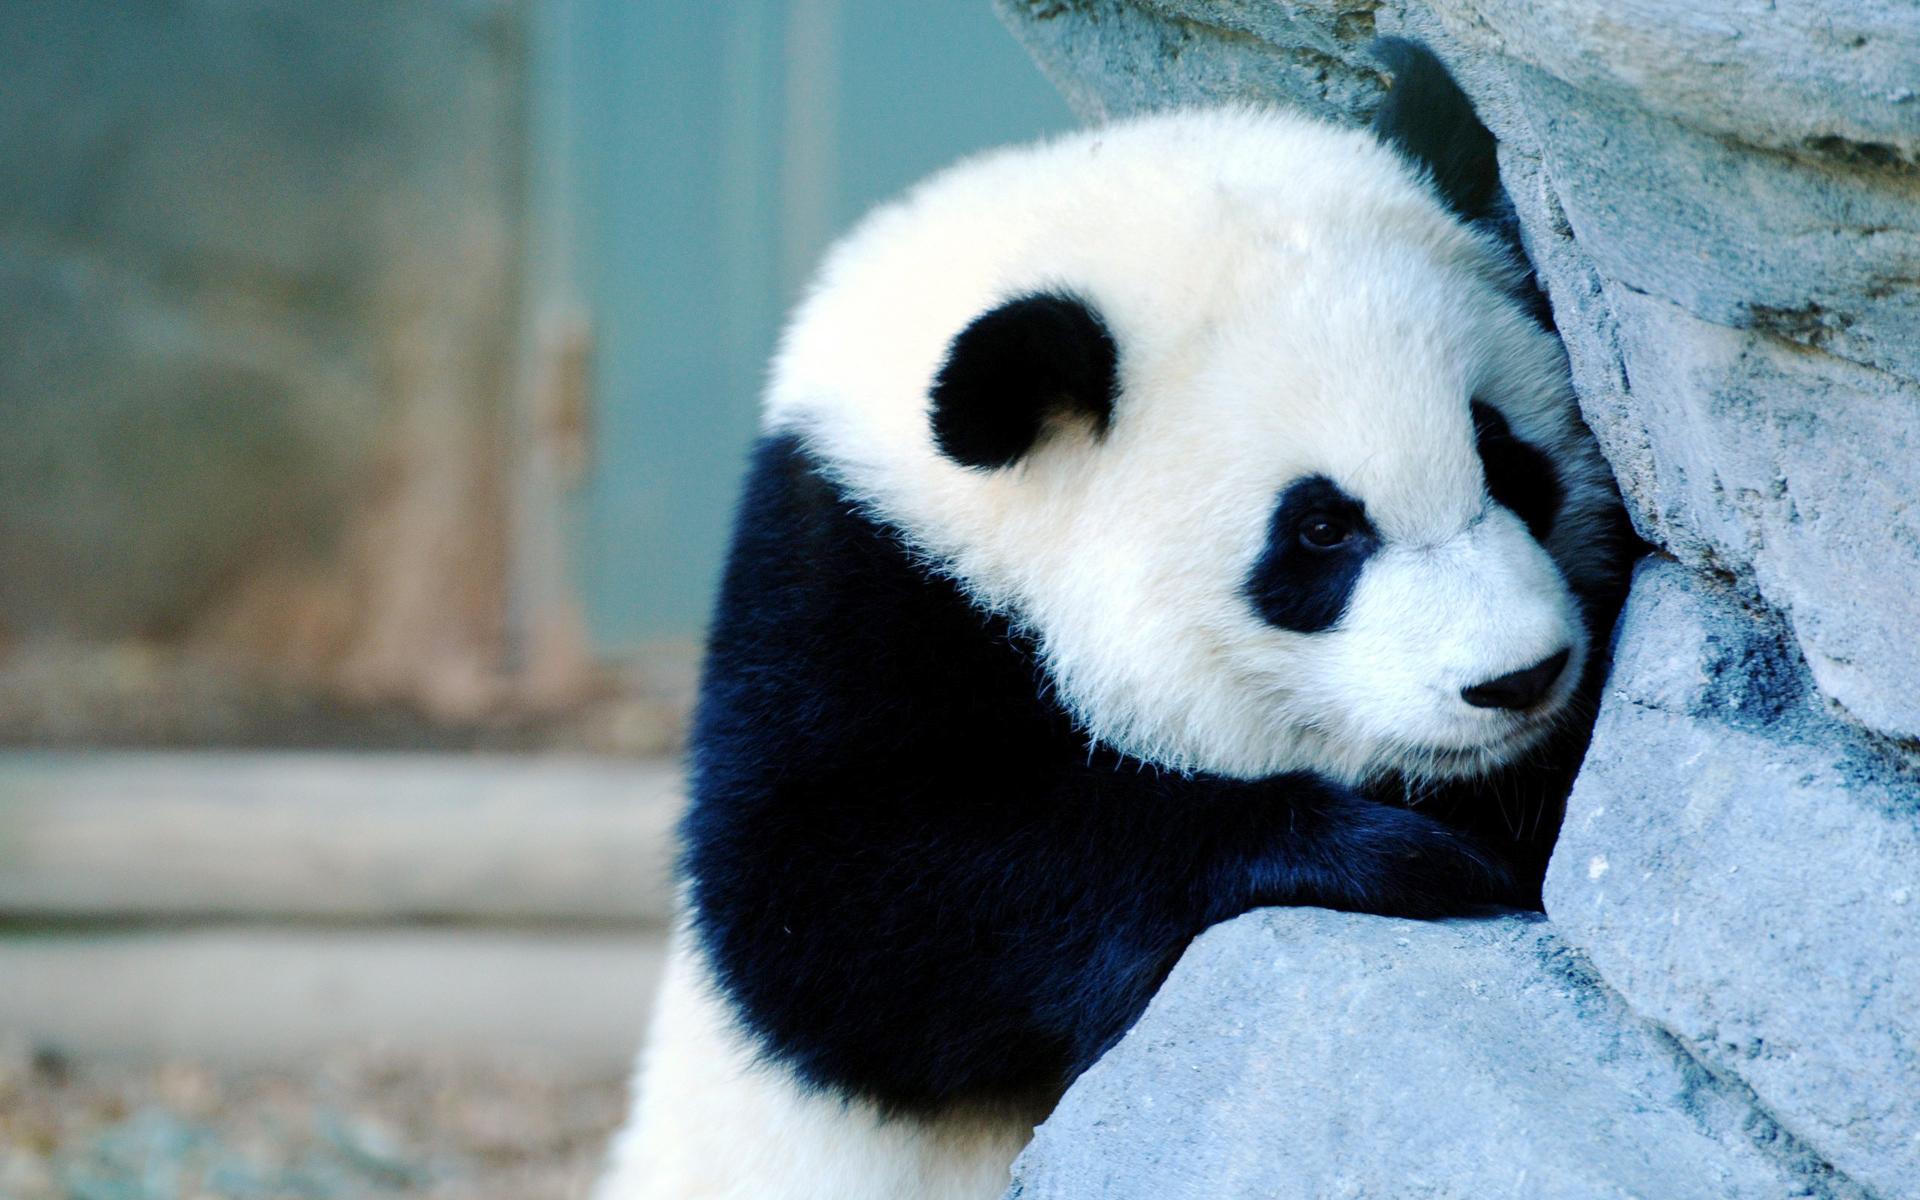 Cute Baby Panda Pics: Beautiful Animals Wallpapers HD Desktop Widescreen Free